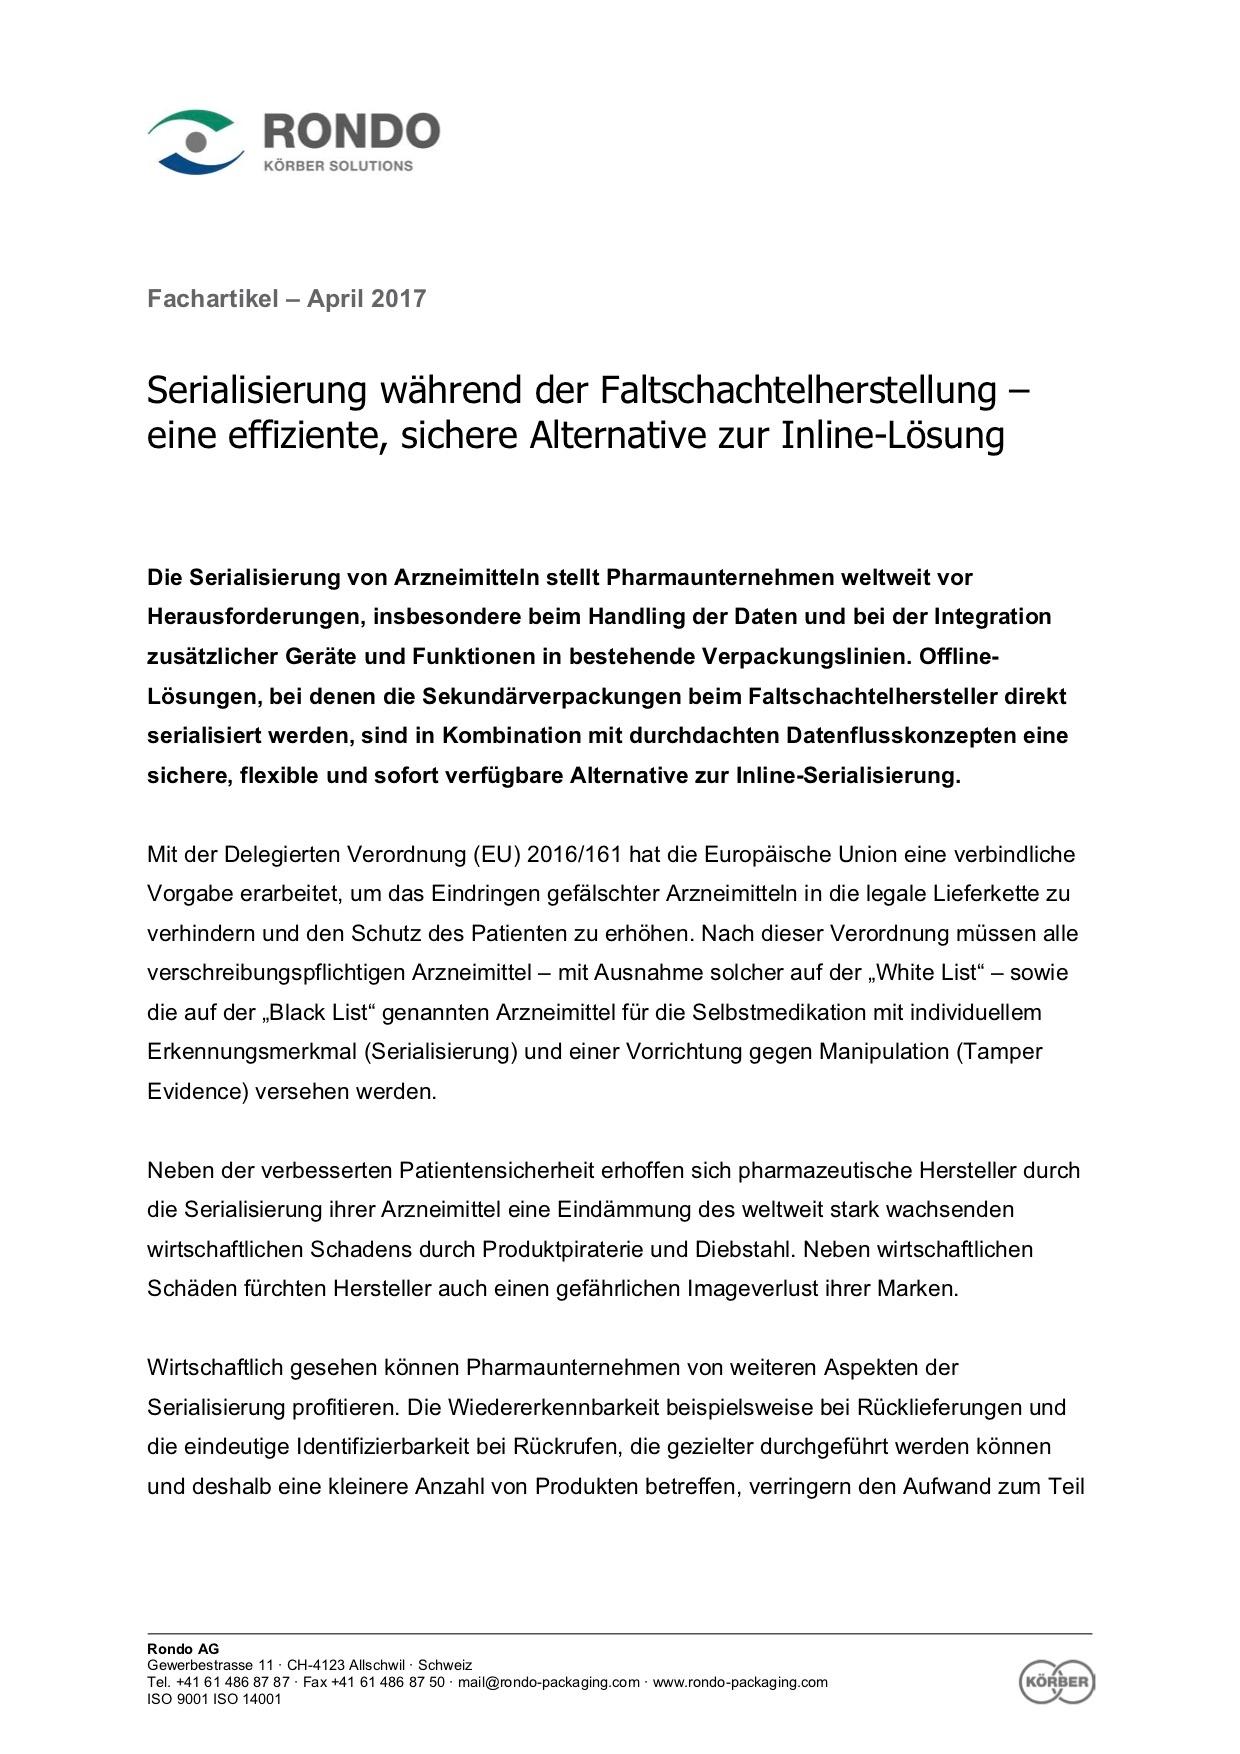 2017-04_Serialisierung_waehrend_der_Faltschachtelherstellung_DE